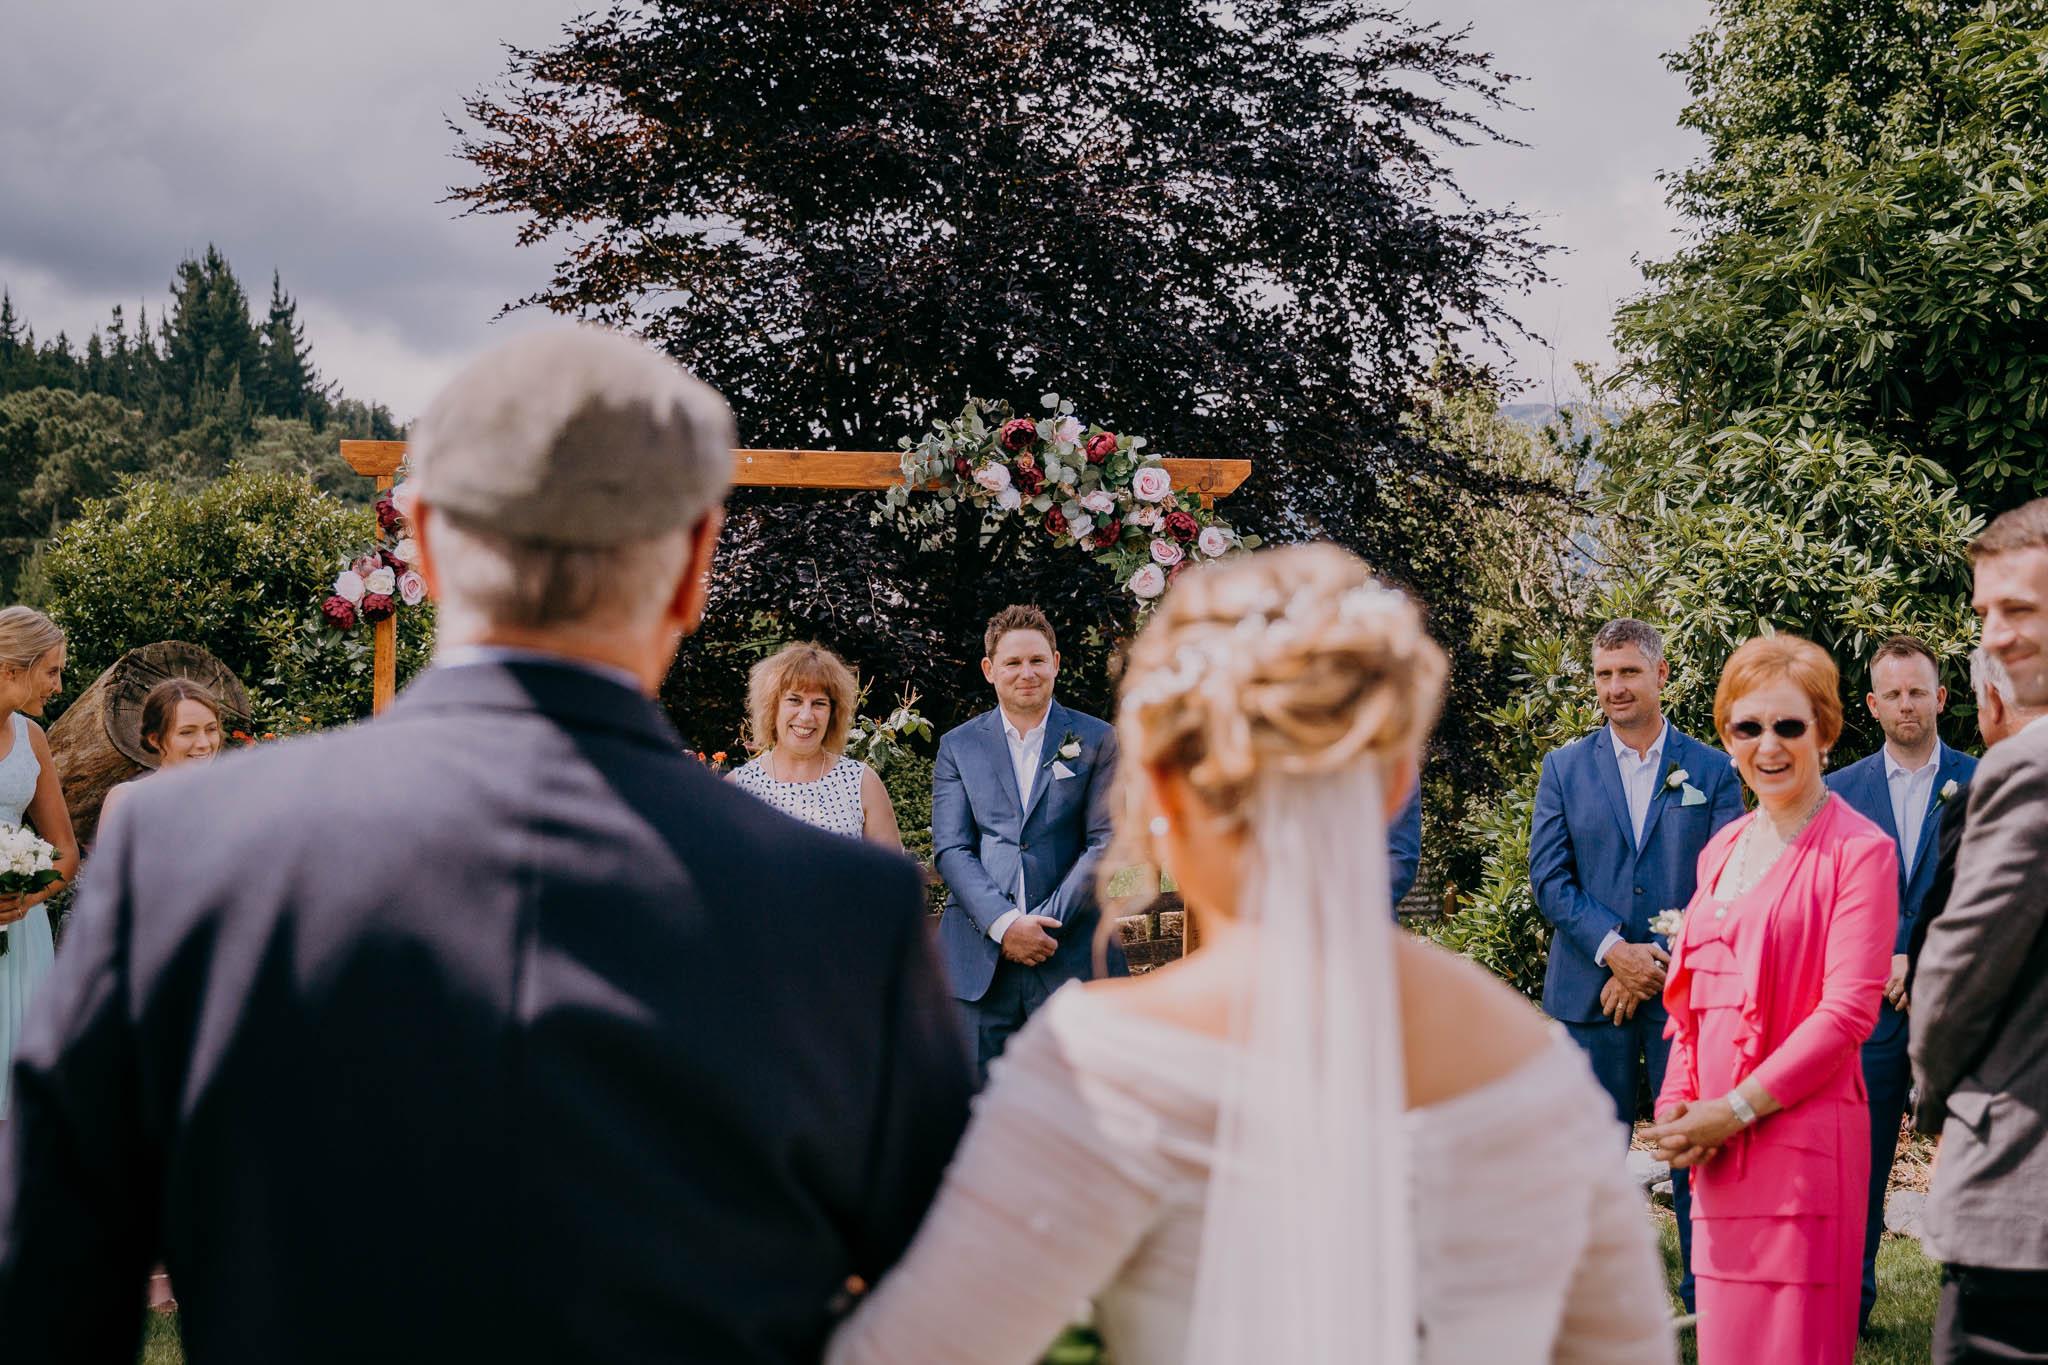 Beth Dunn wedding celebrant